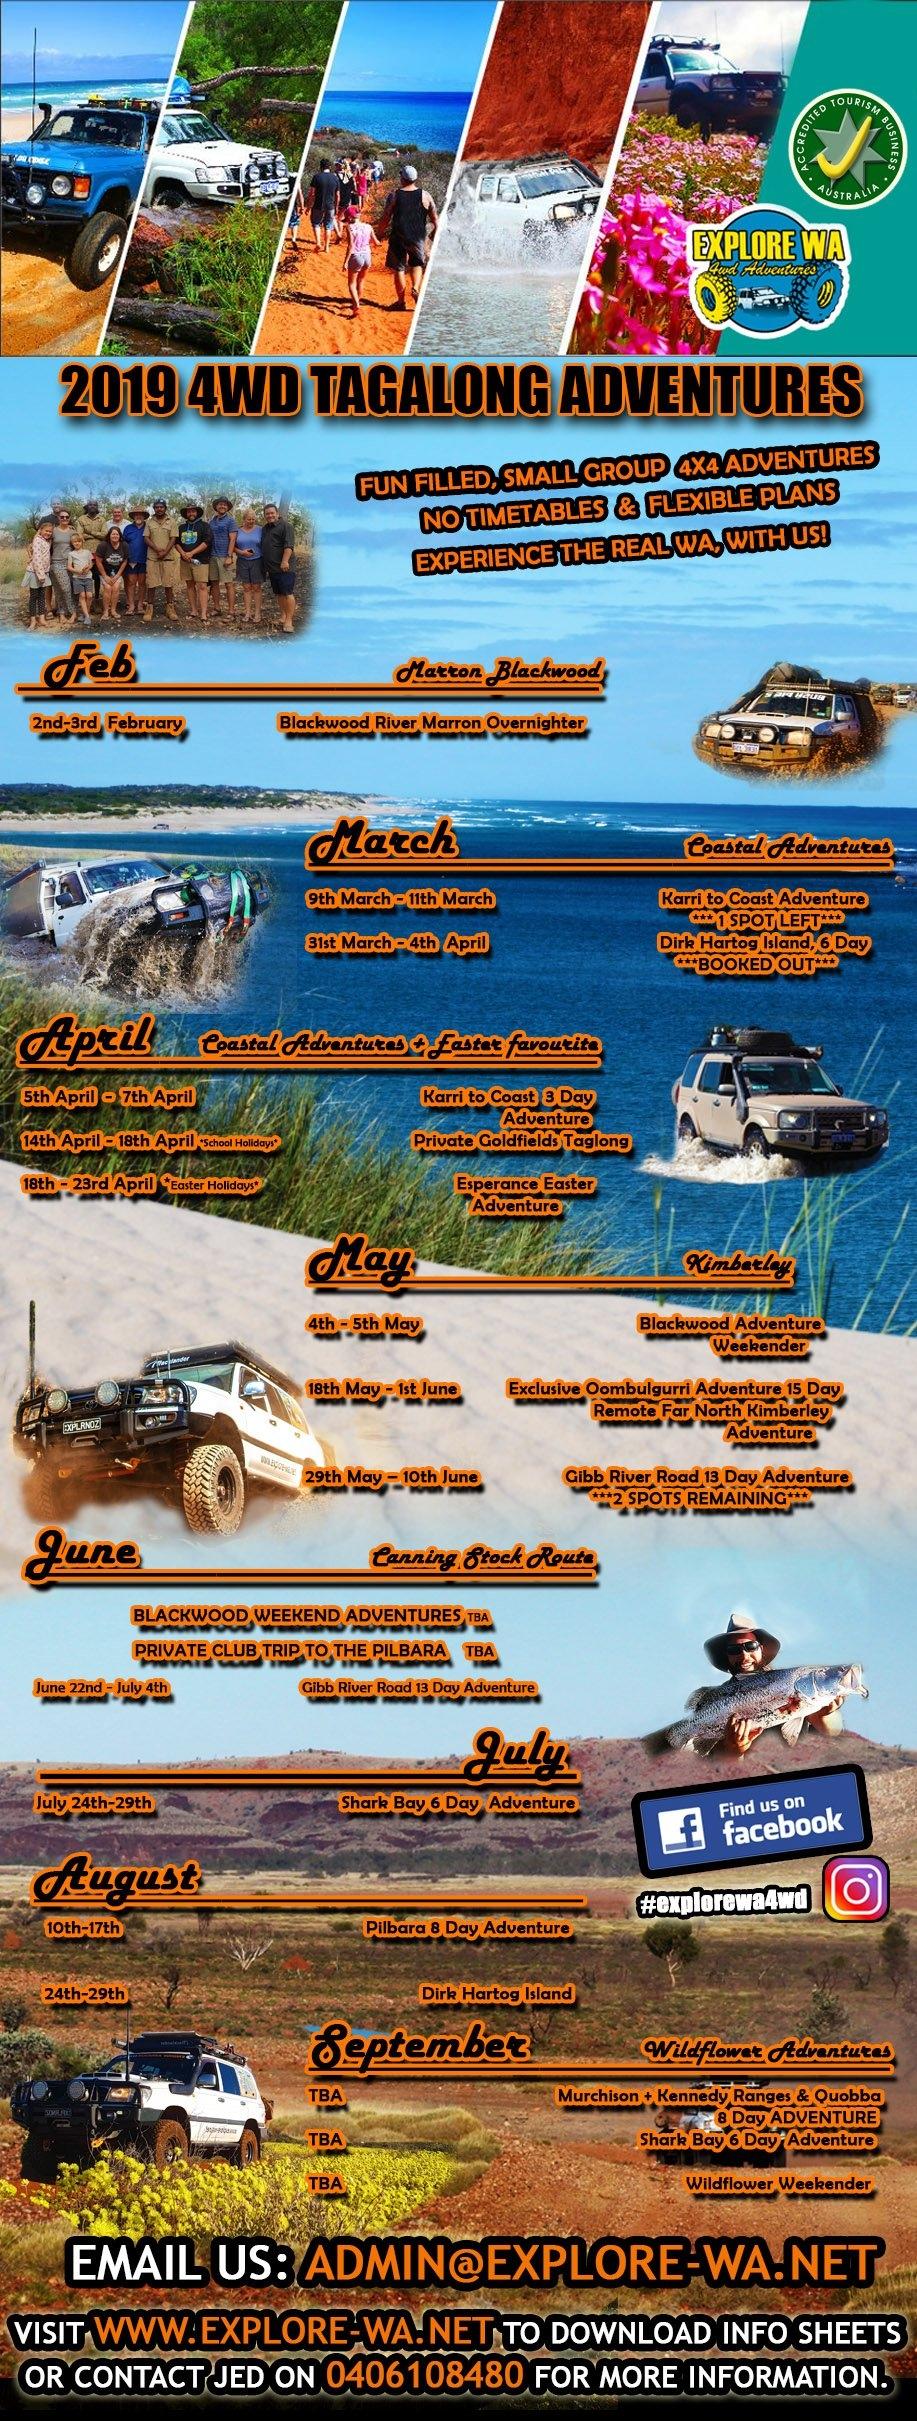 Karri To Coast 3 Day Tag-A-Long – Explore Wa 4Wd Calendar 2019